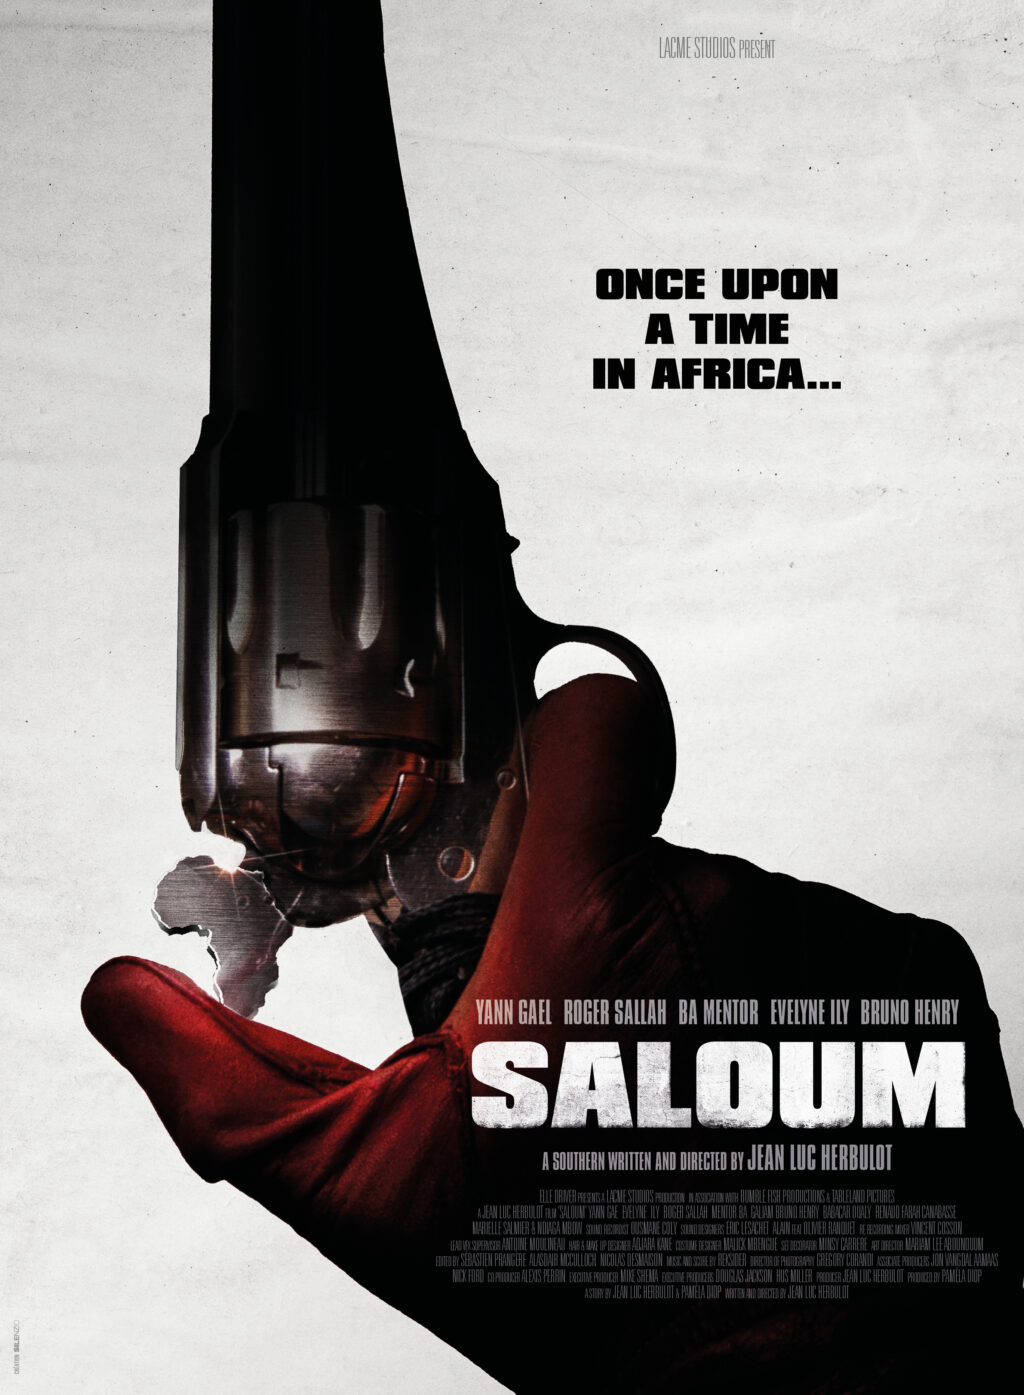 SALOUM TEASER POSTER FINAL Poster by Julien Lemoine 1024x1395 - New Clip and Poster for Jean Luc Herbulot's 'Saloum'